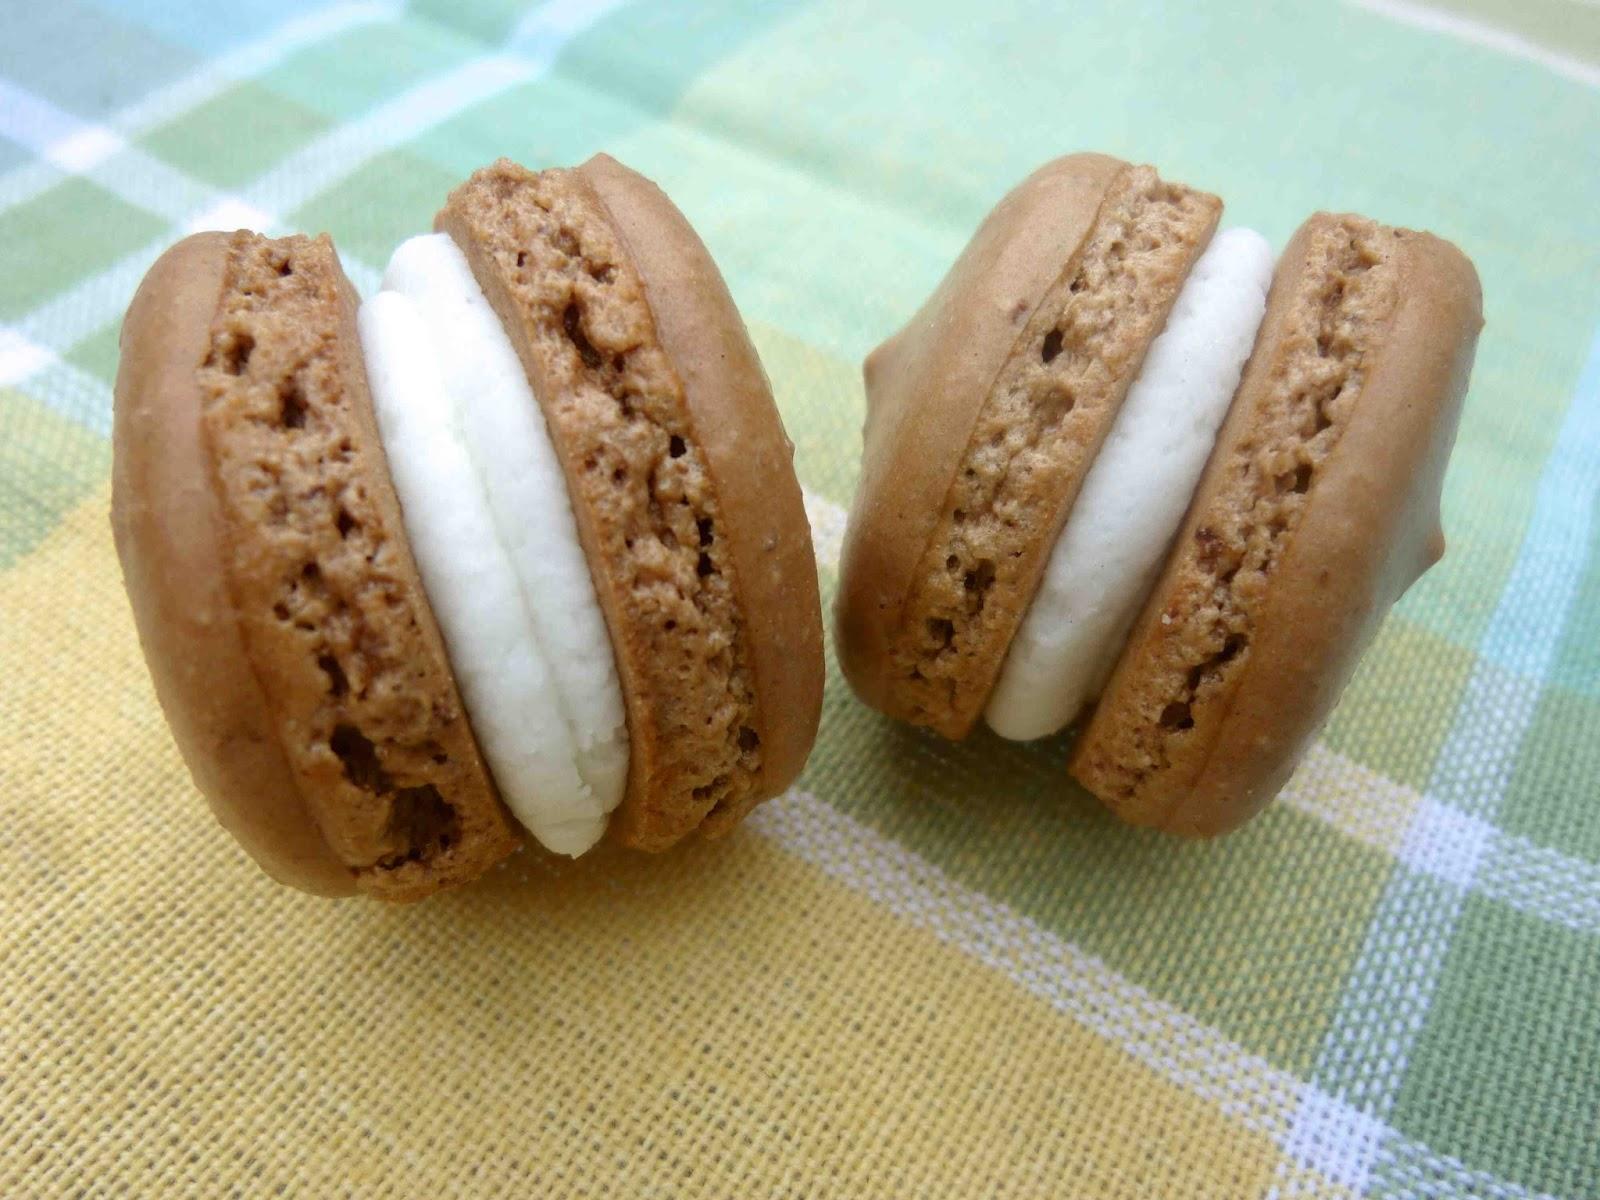 ... : Mini Espresso Macarons with Lemon Verbena Buttercream Filling